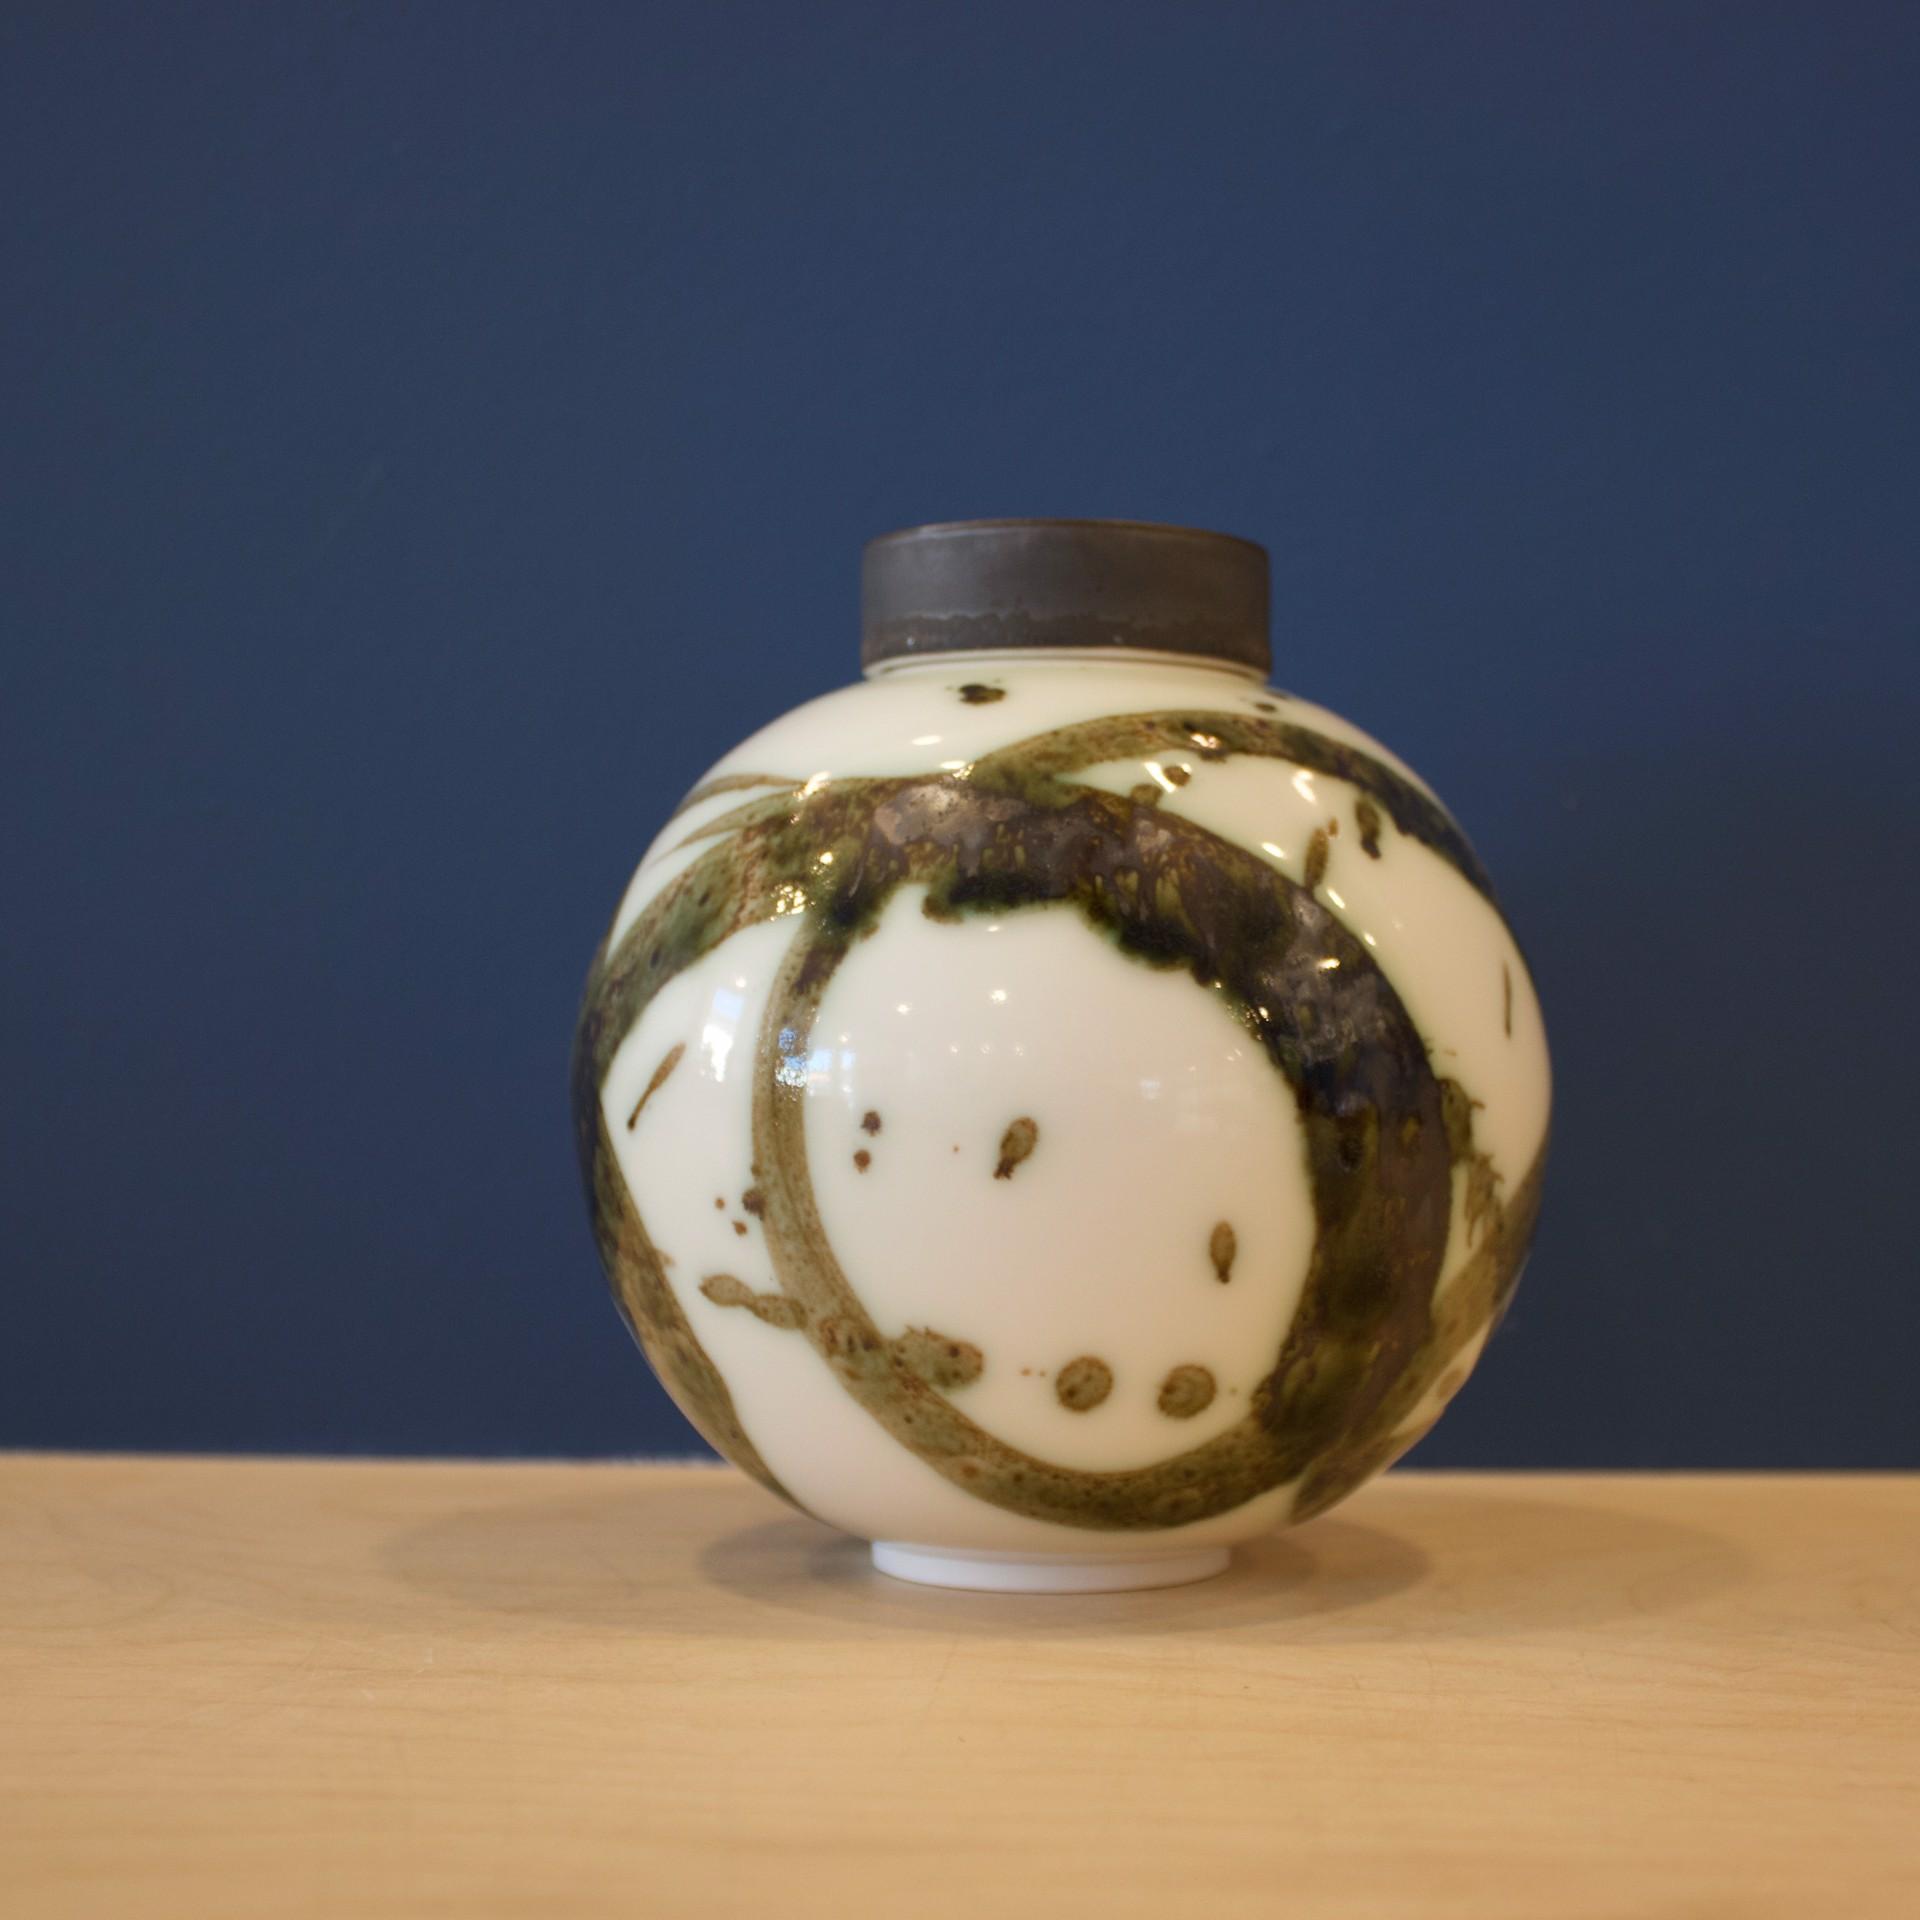 Splash Small Round Ginger Jar by Patricia Thom